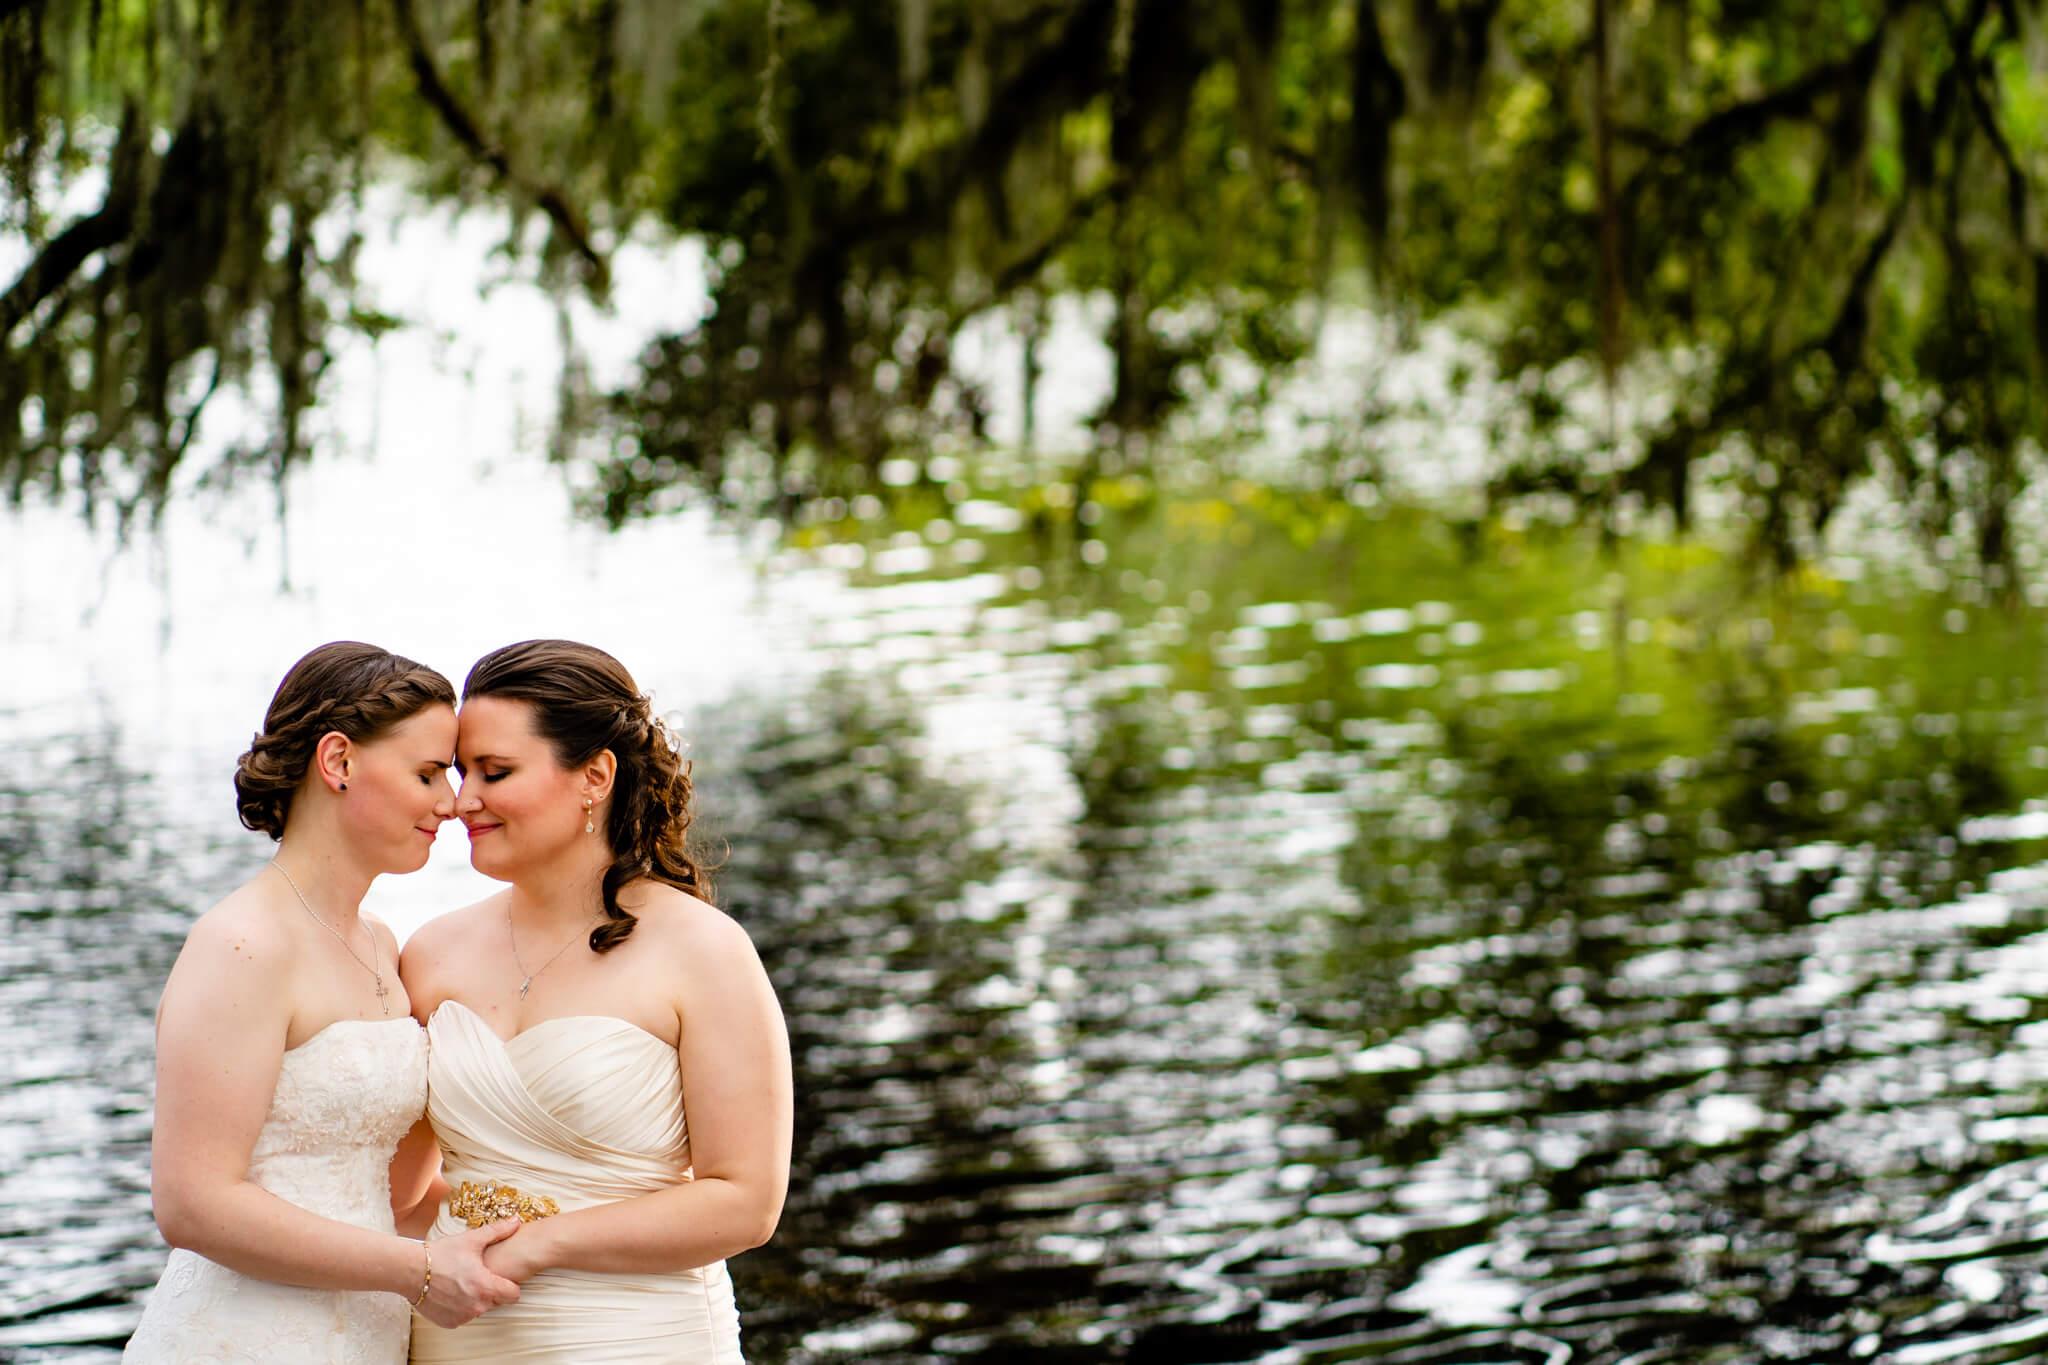 Catherine Laura University of Florida Wedding Smathers Library Reception Baughman Center Ceremony Lake Alice Wedding-17.jpg